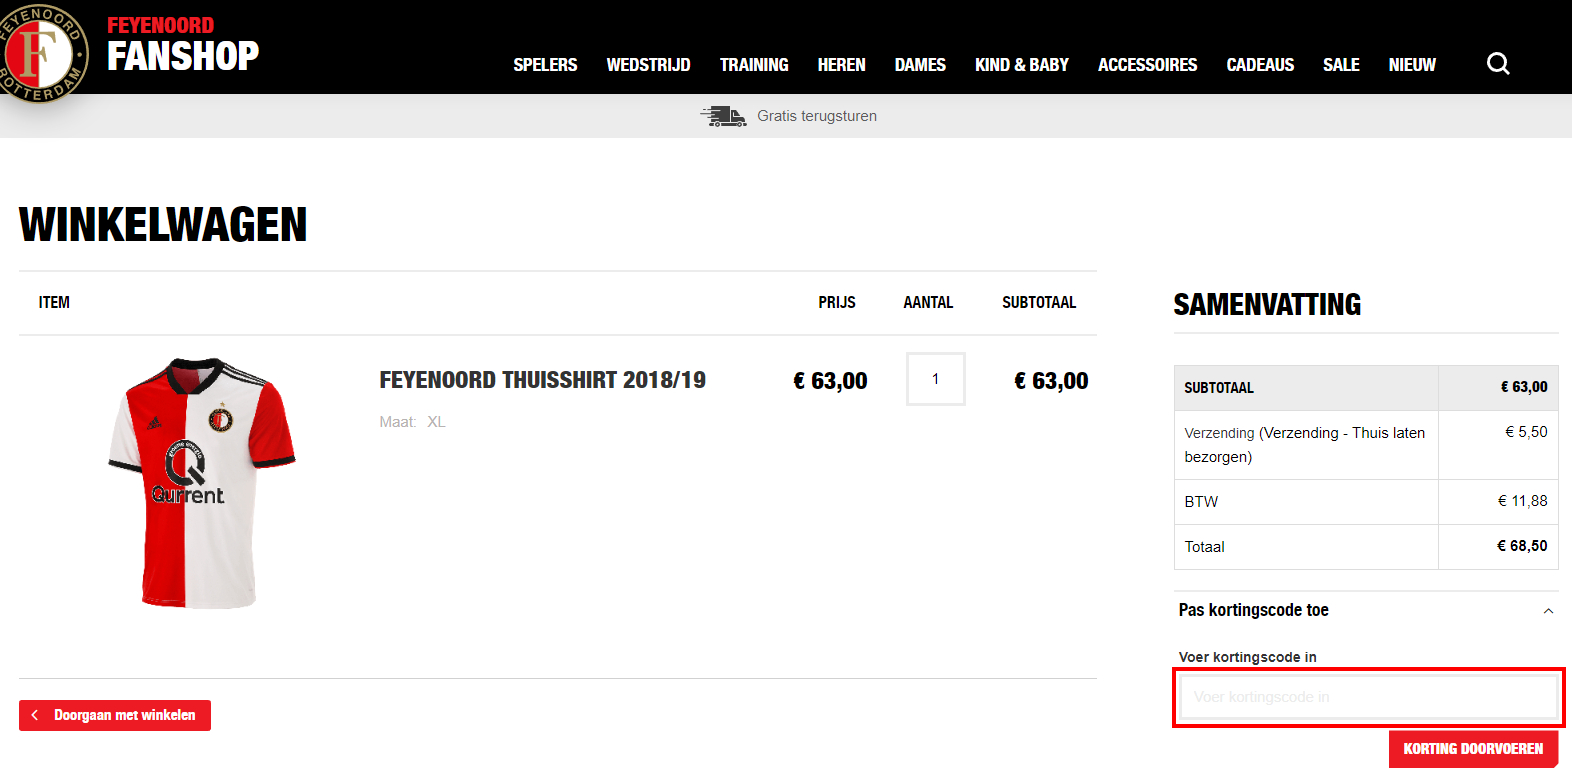 Feyenoord Fanshop kortingscode gebruiken